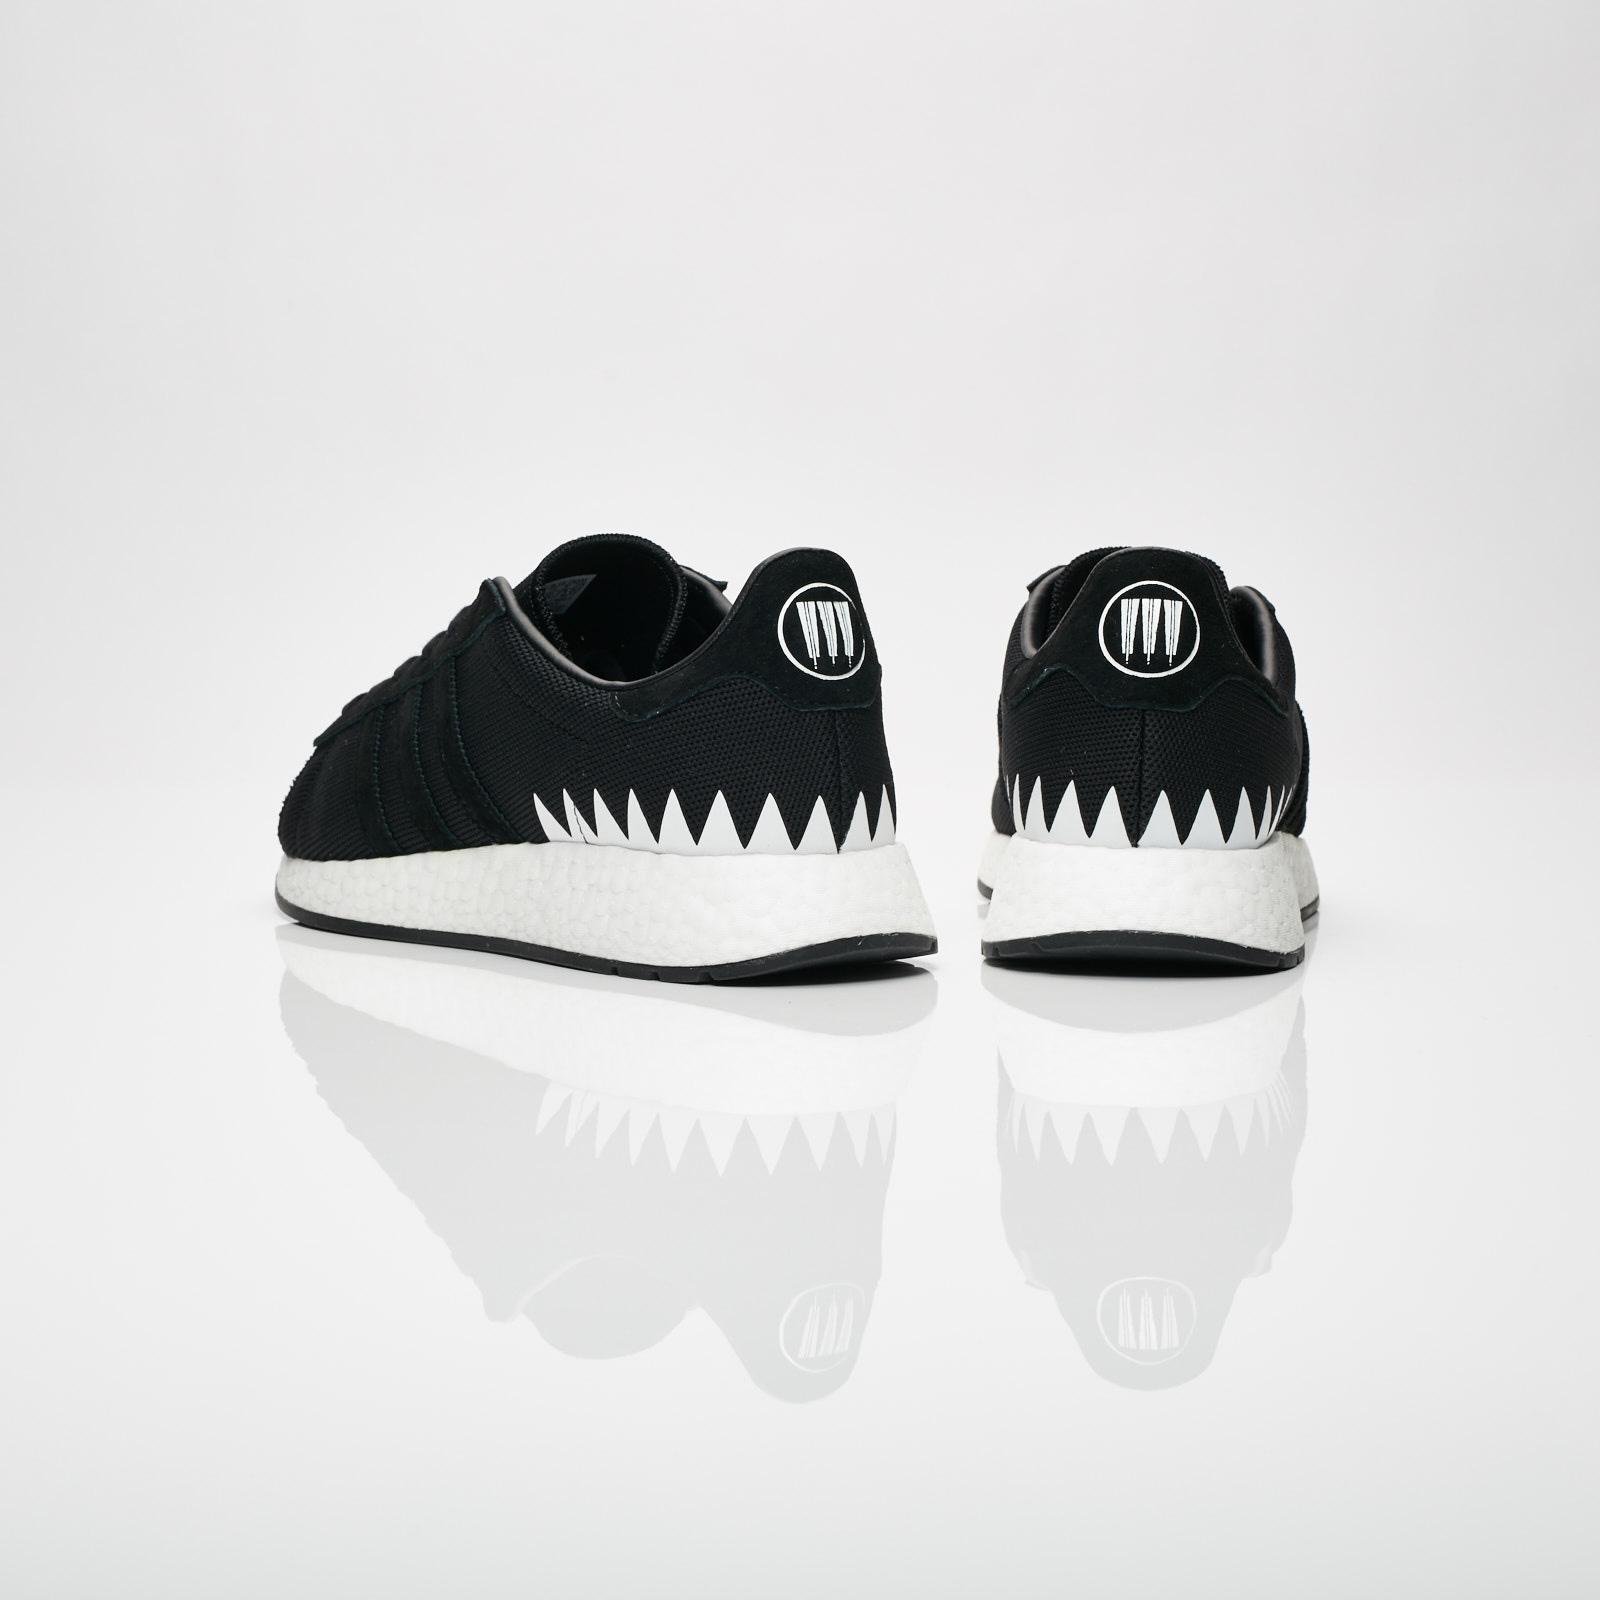 brand new 7555c f471f adidas Consortium Chop Shop x Neighborhood adidas Consortium Chop Shop x  Neighborhood ...